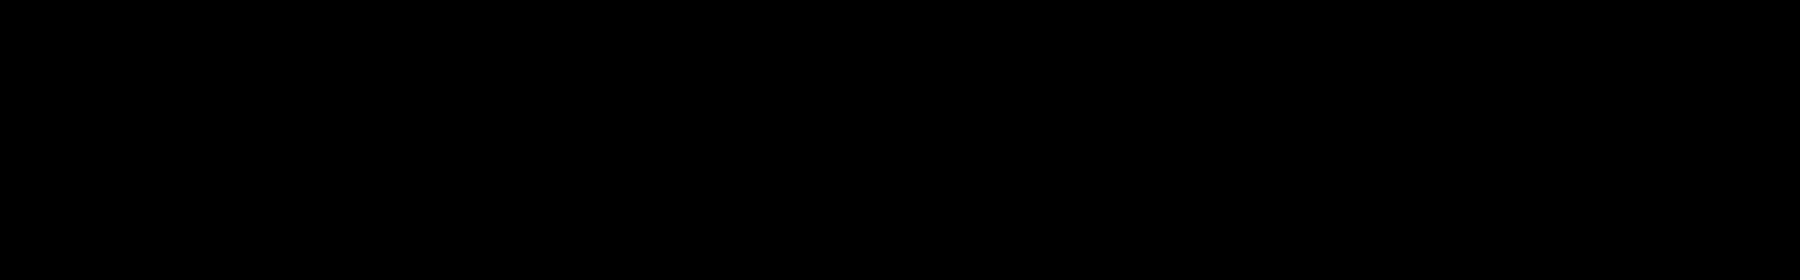 Desza 2 audio waveform